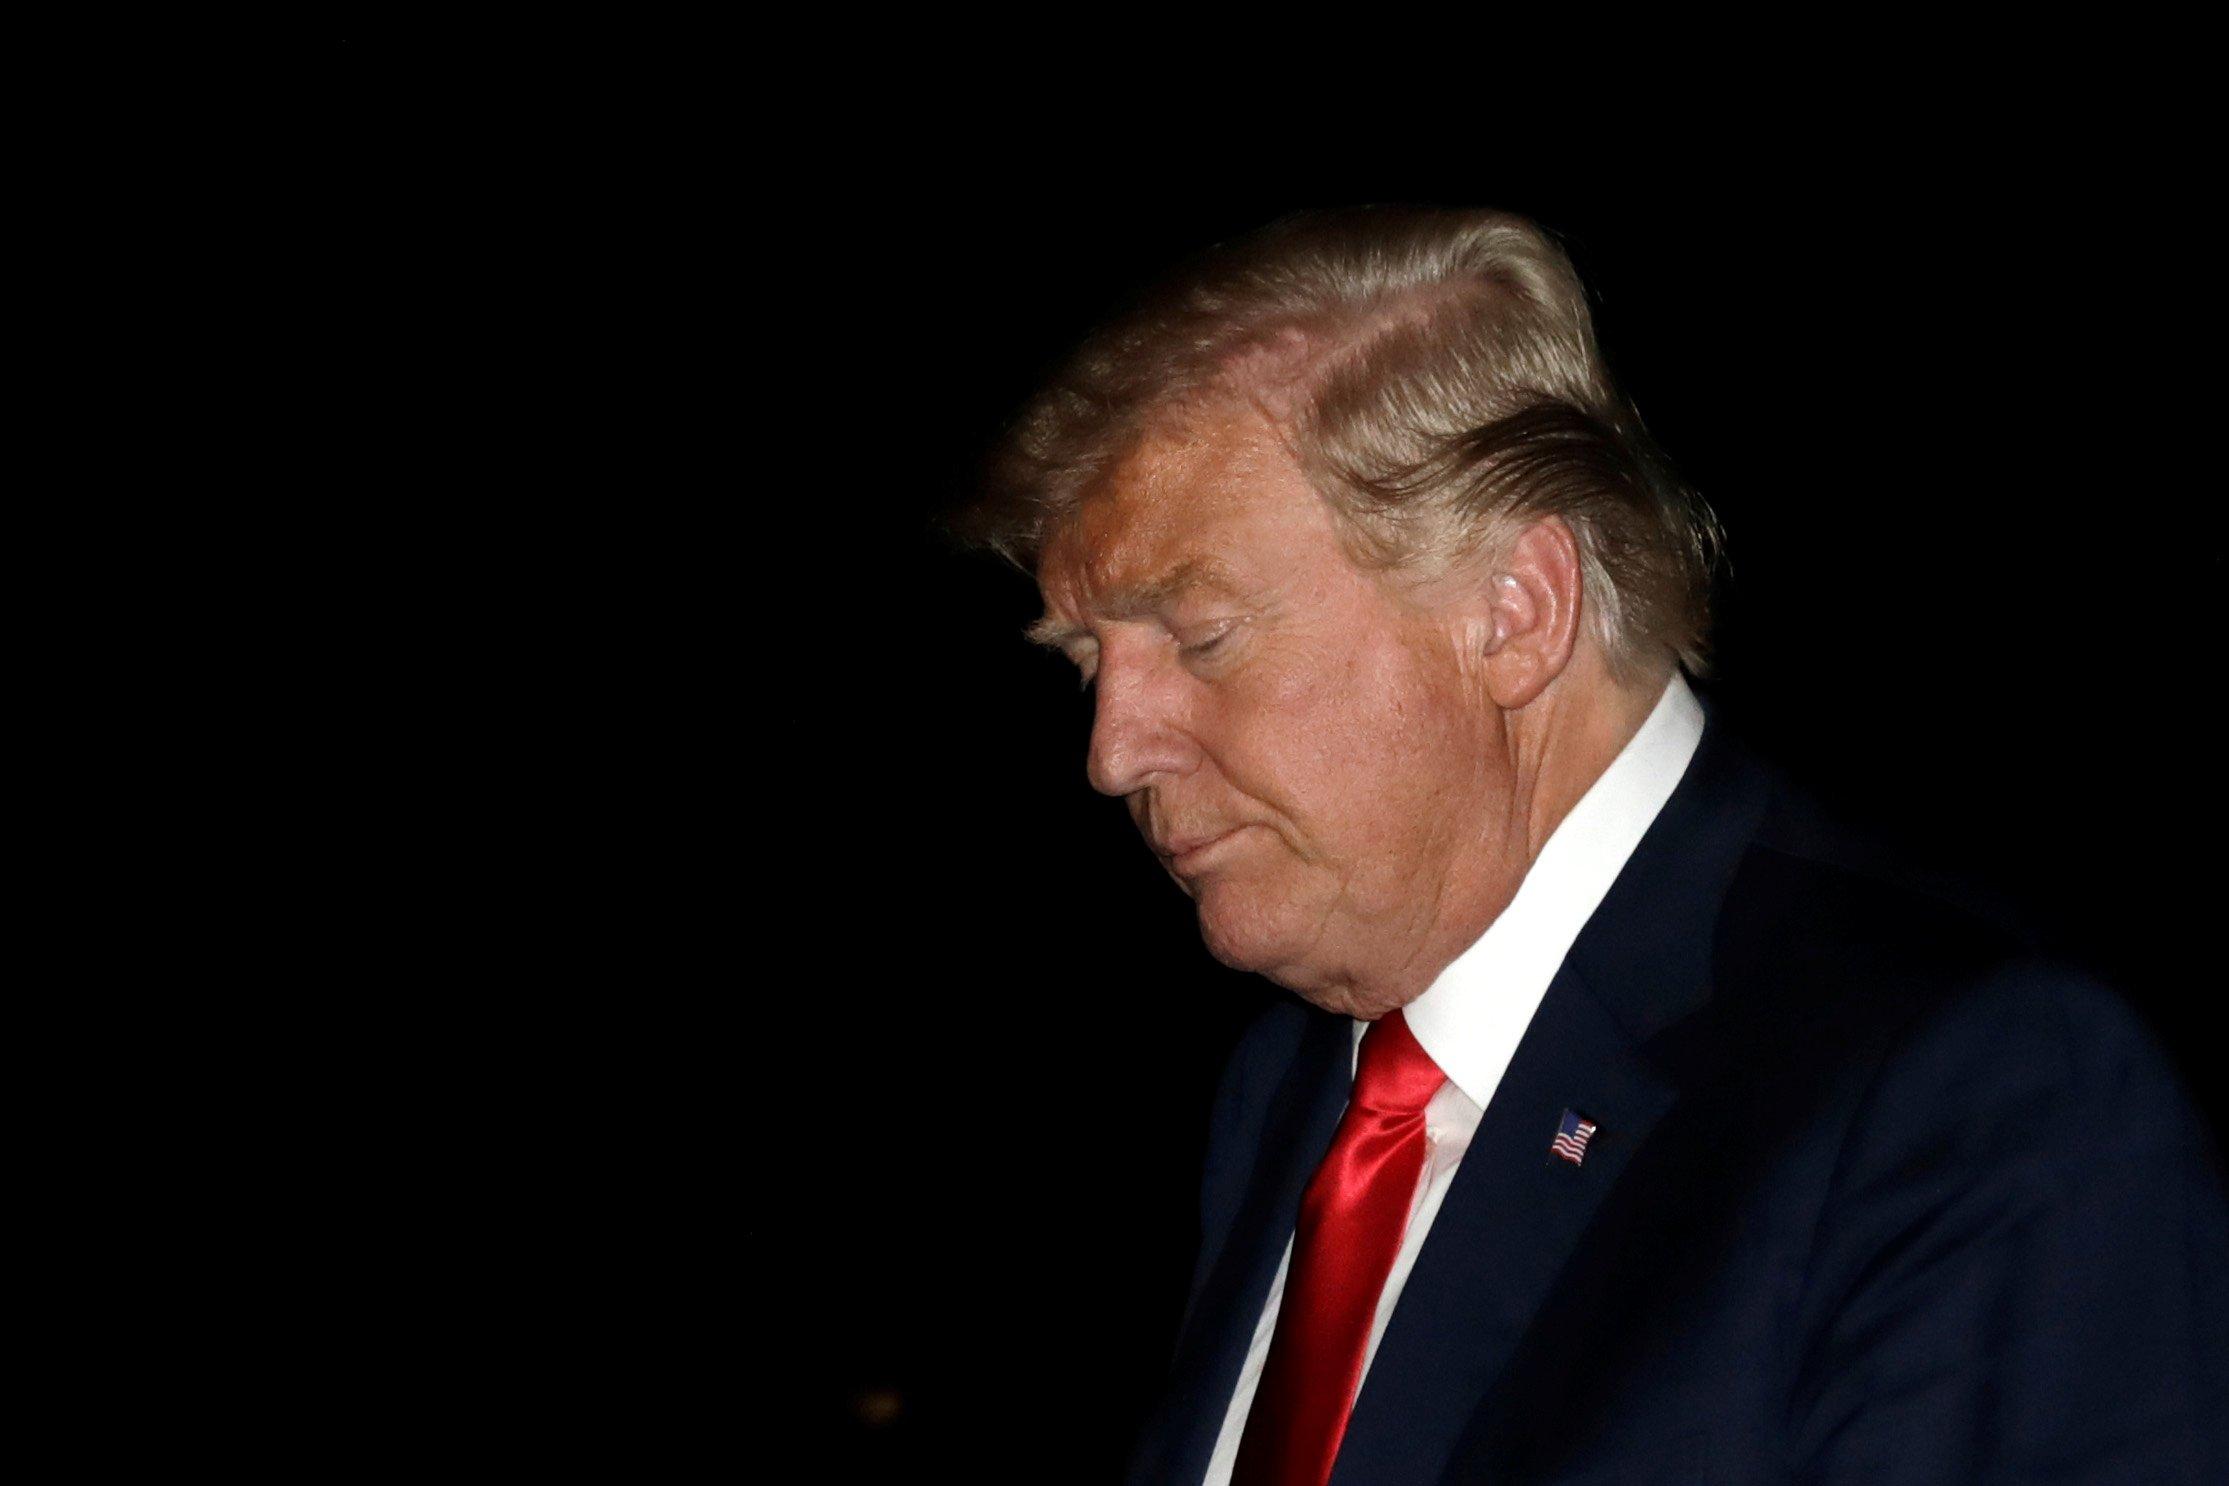 Дональд Трамп полностью в кармане Владимира Путина, полагает экс-глава ЦРУ